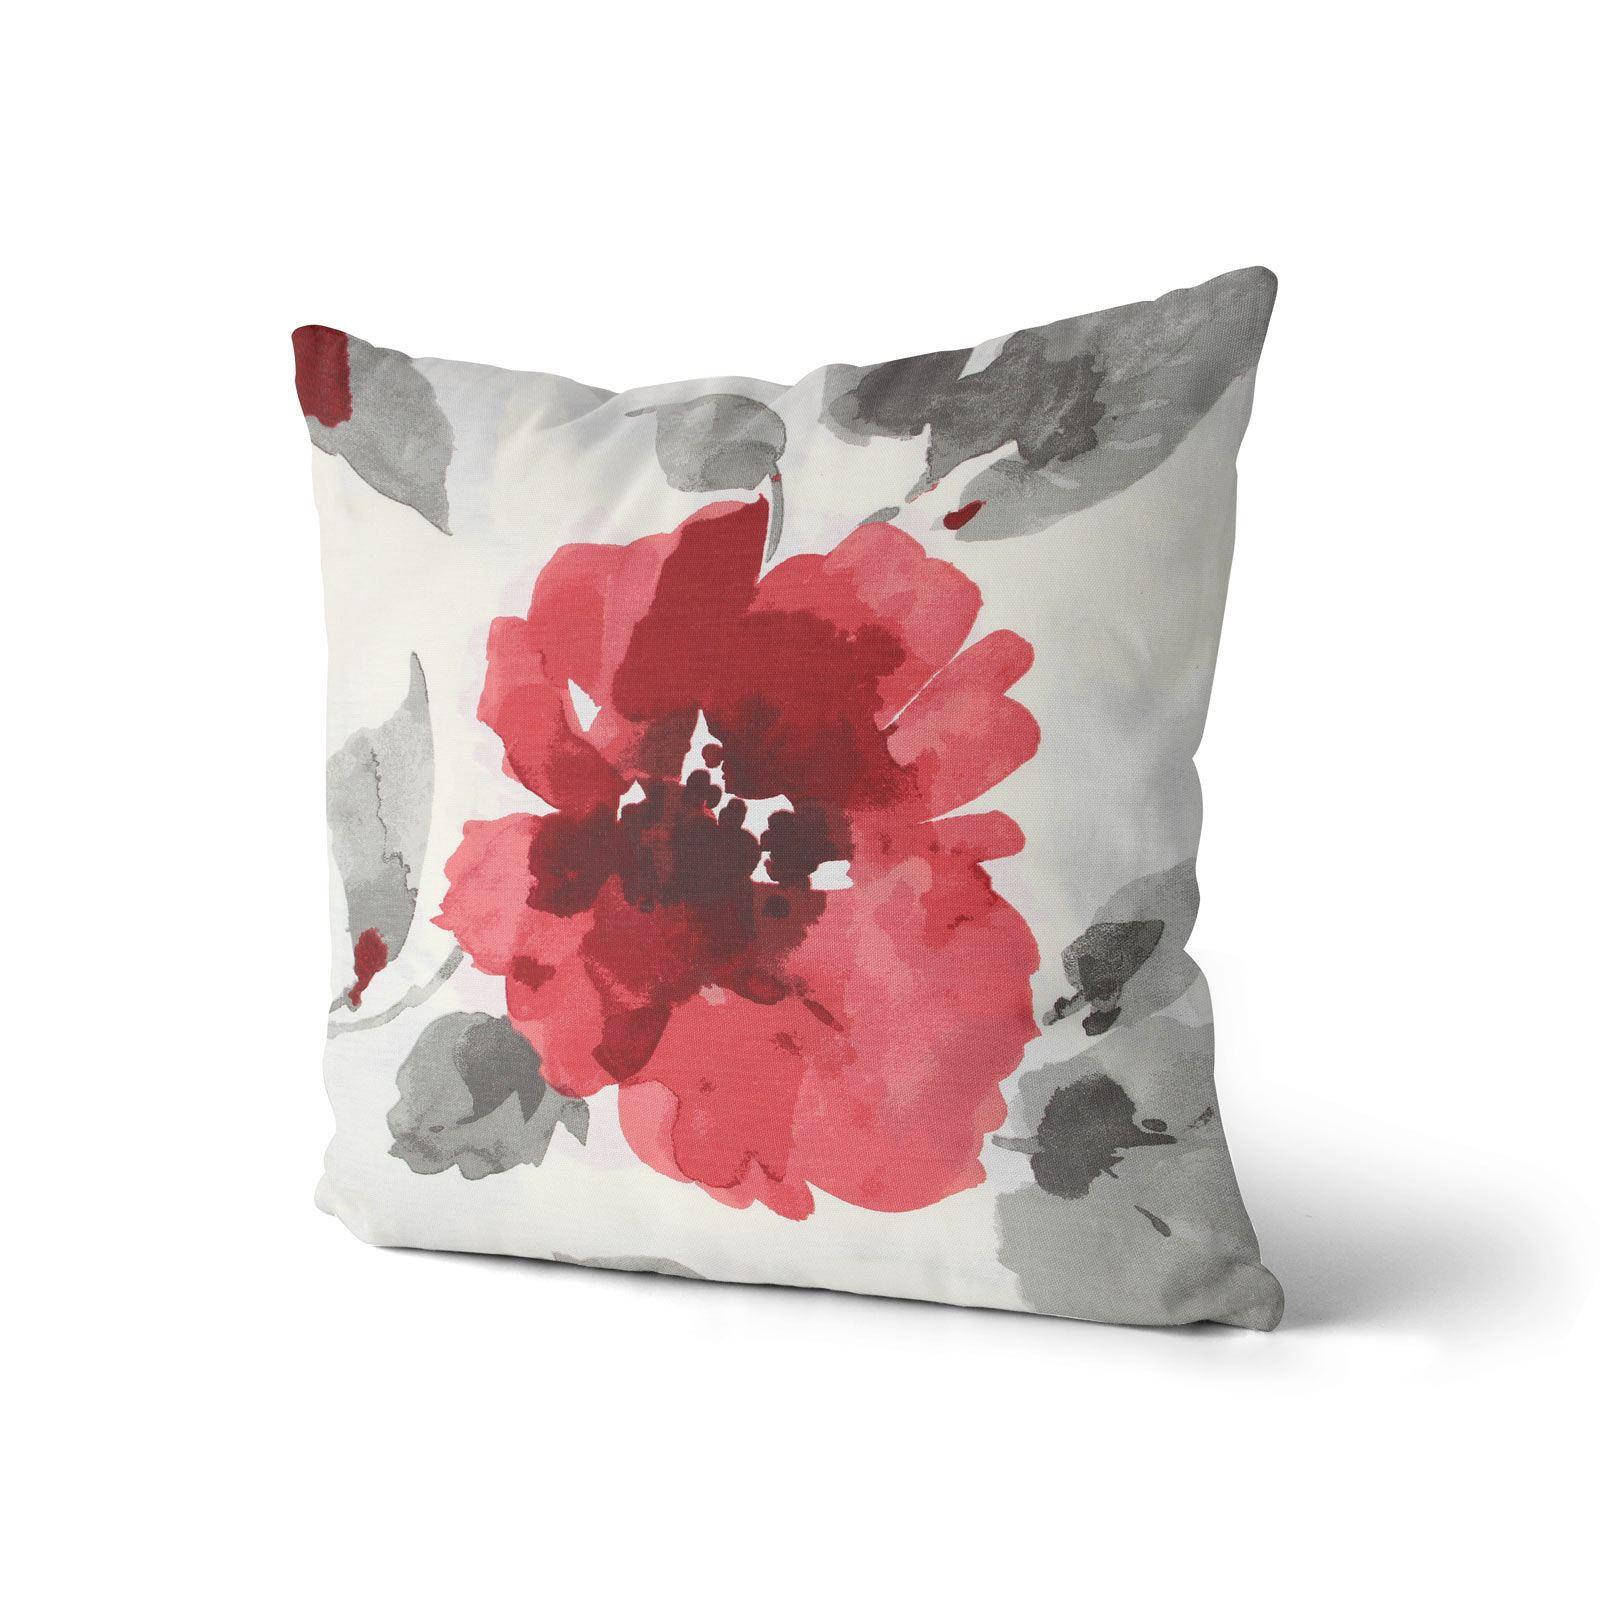 Vino-Tinto-Cushion-Covers-Coleccion-17-034-18-034-43cm-45cm-Cubierta miniatura 11